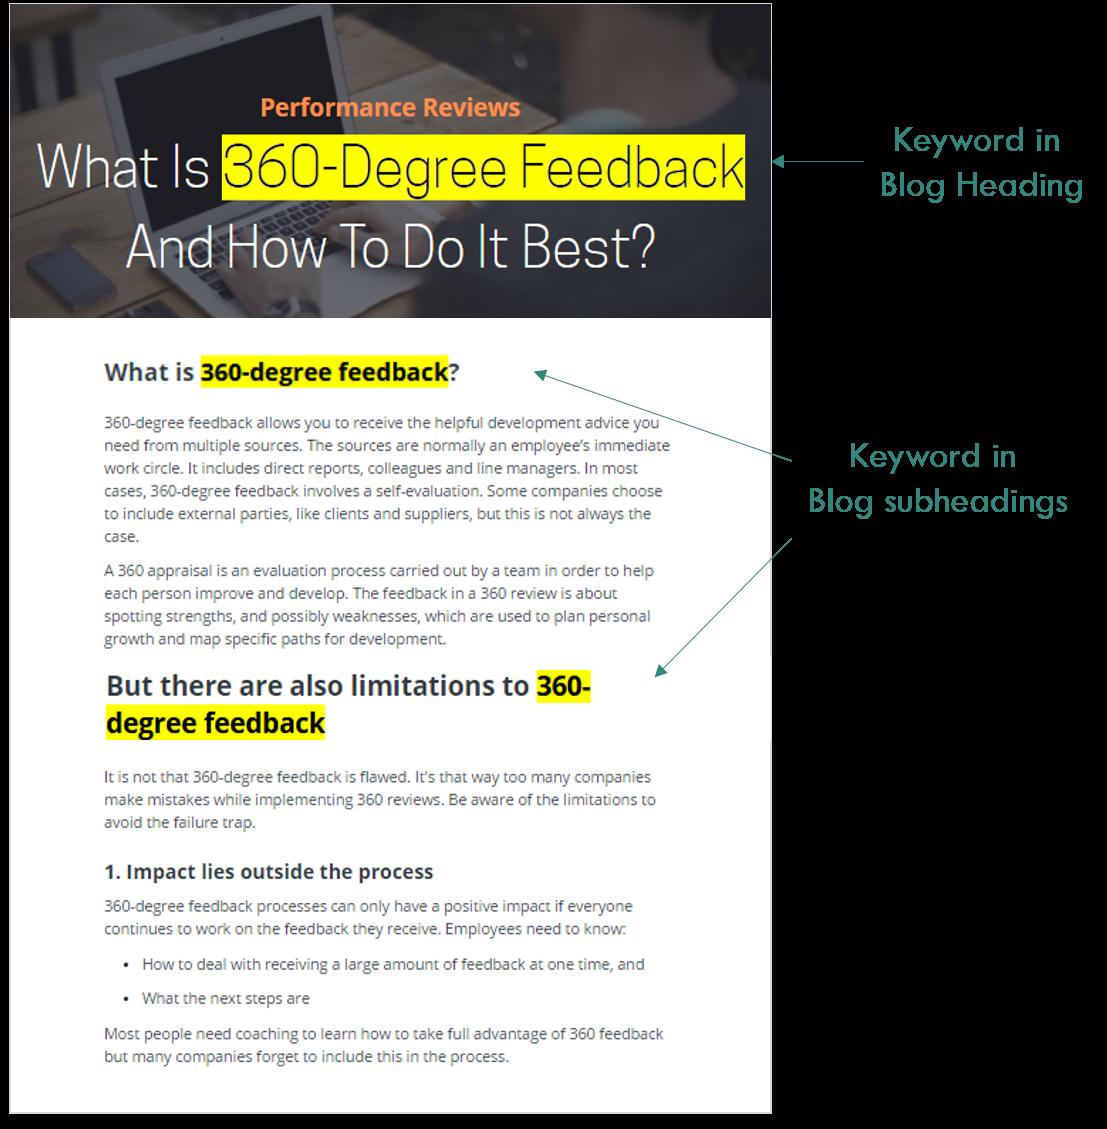 Blog Headings Impraise Blog Example Blog Headings Subheadings Boost SEO Example 2